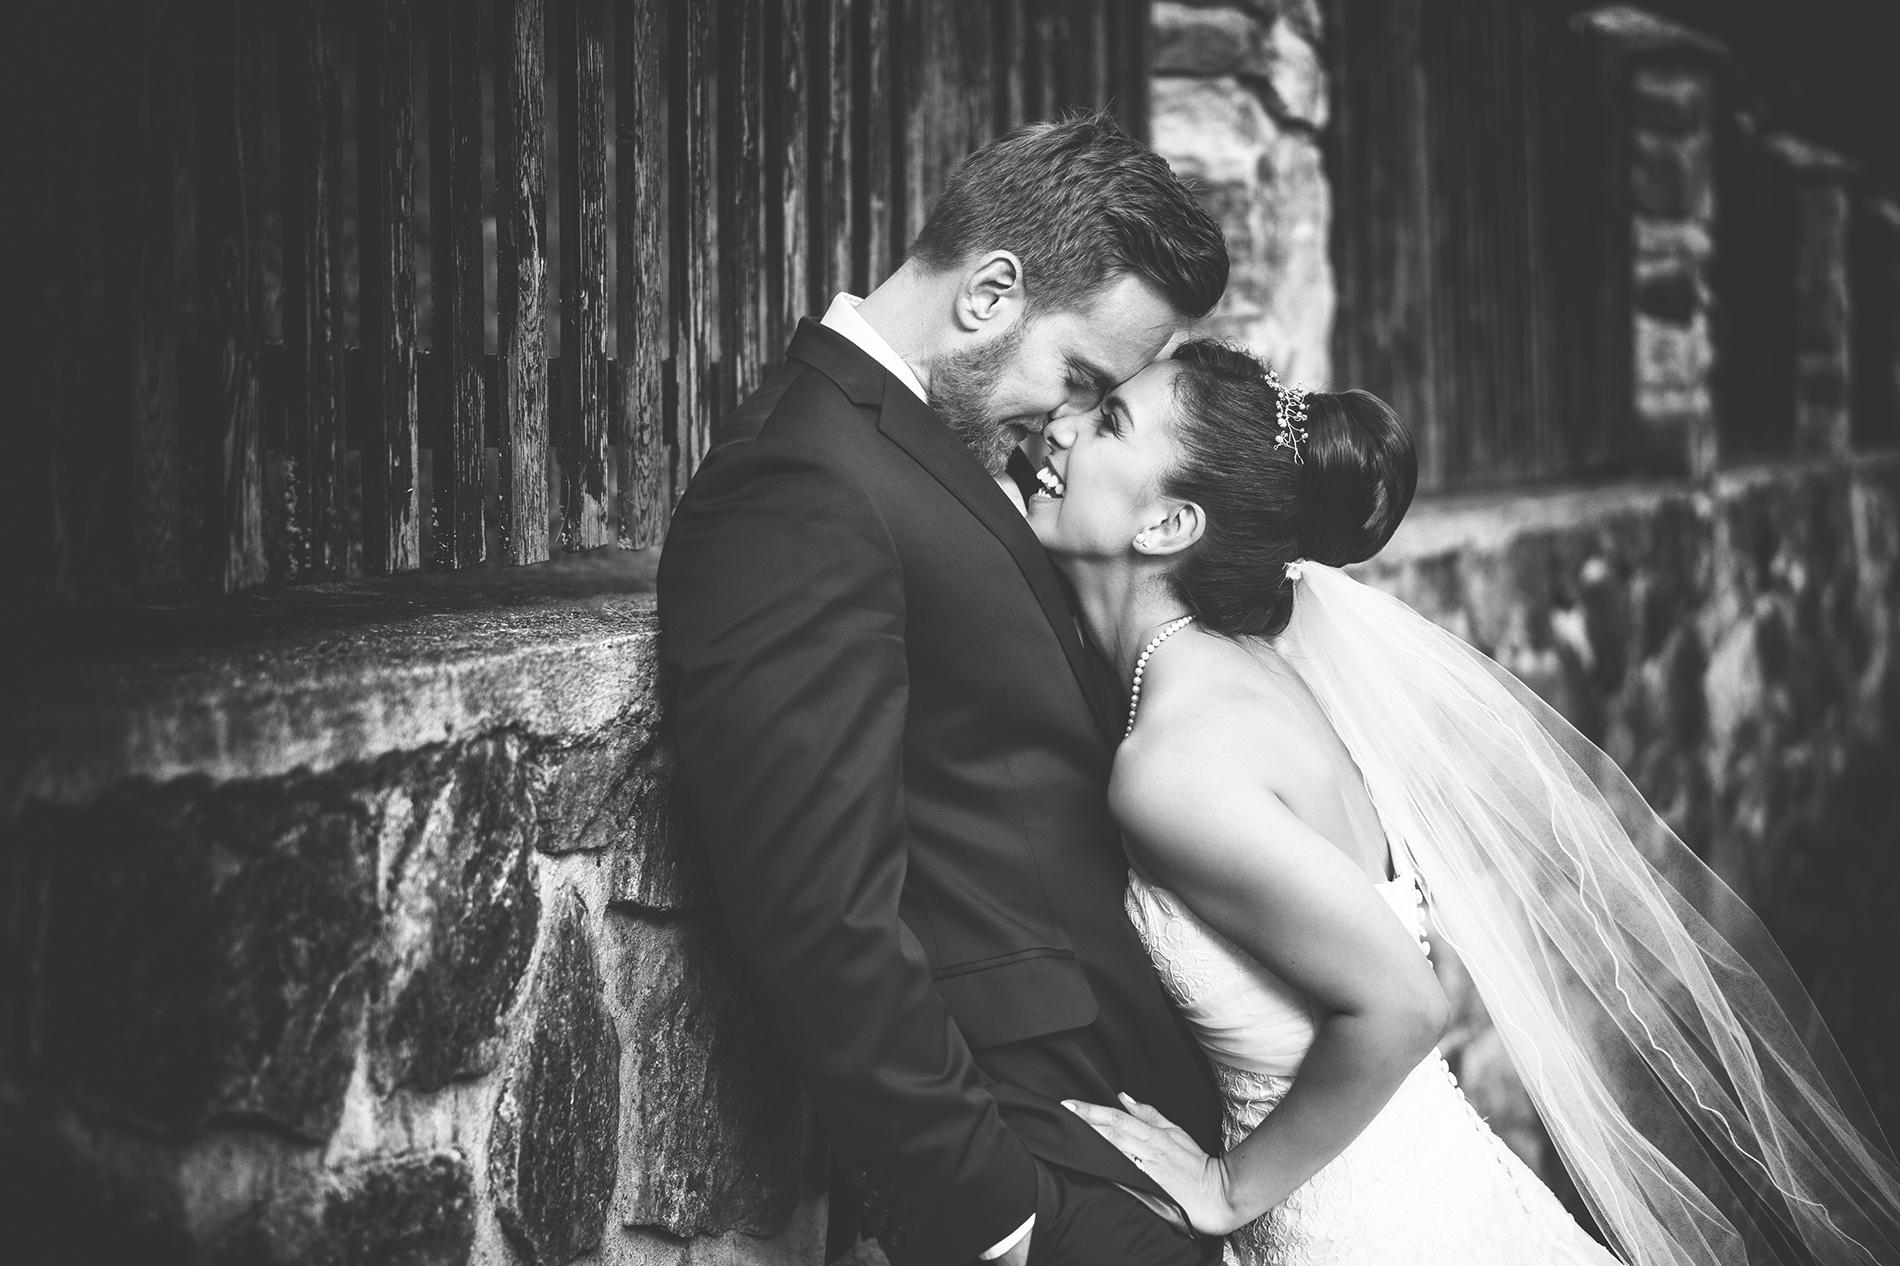 svatební fotograf - Farma Michael